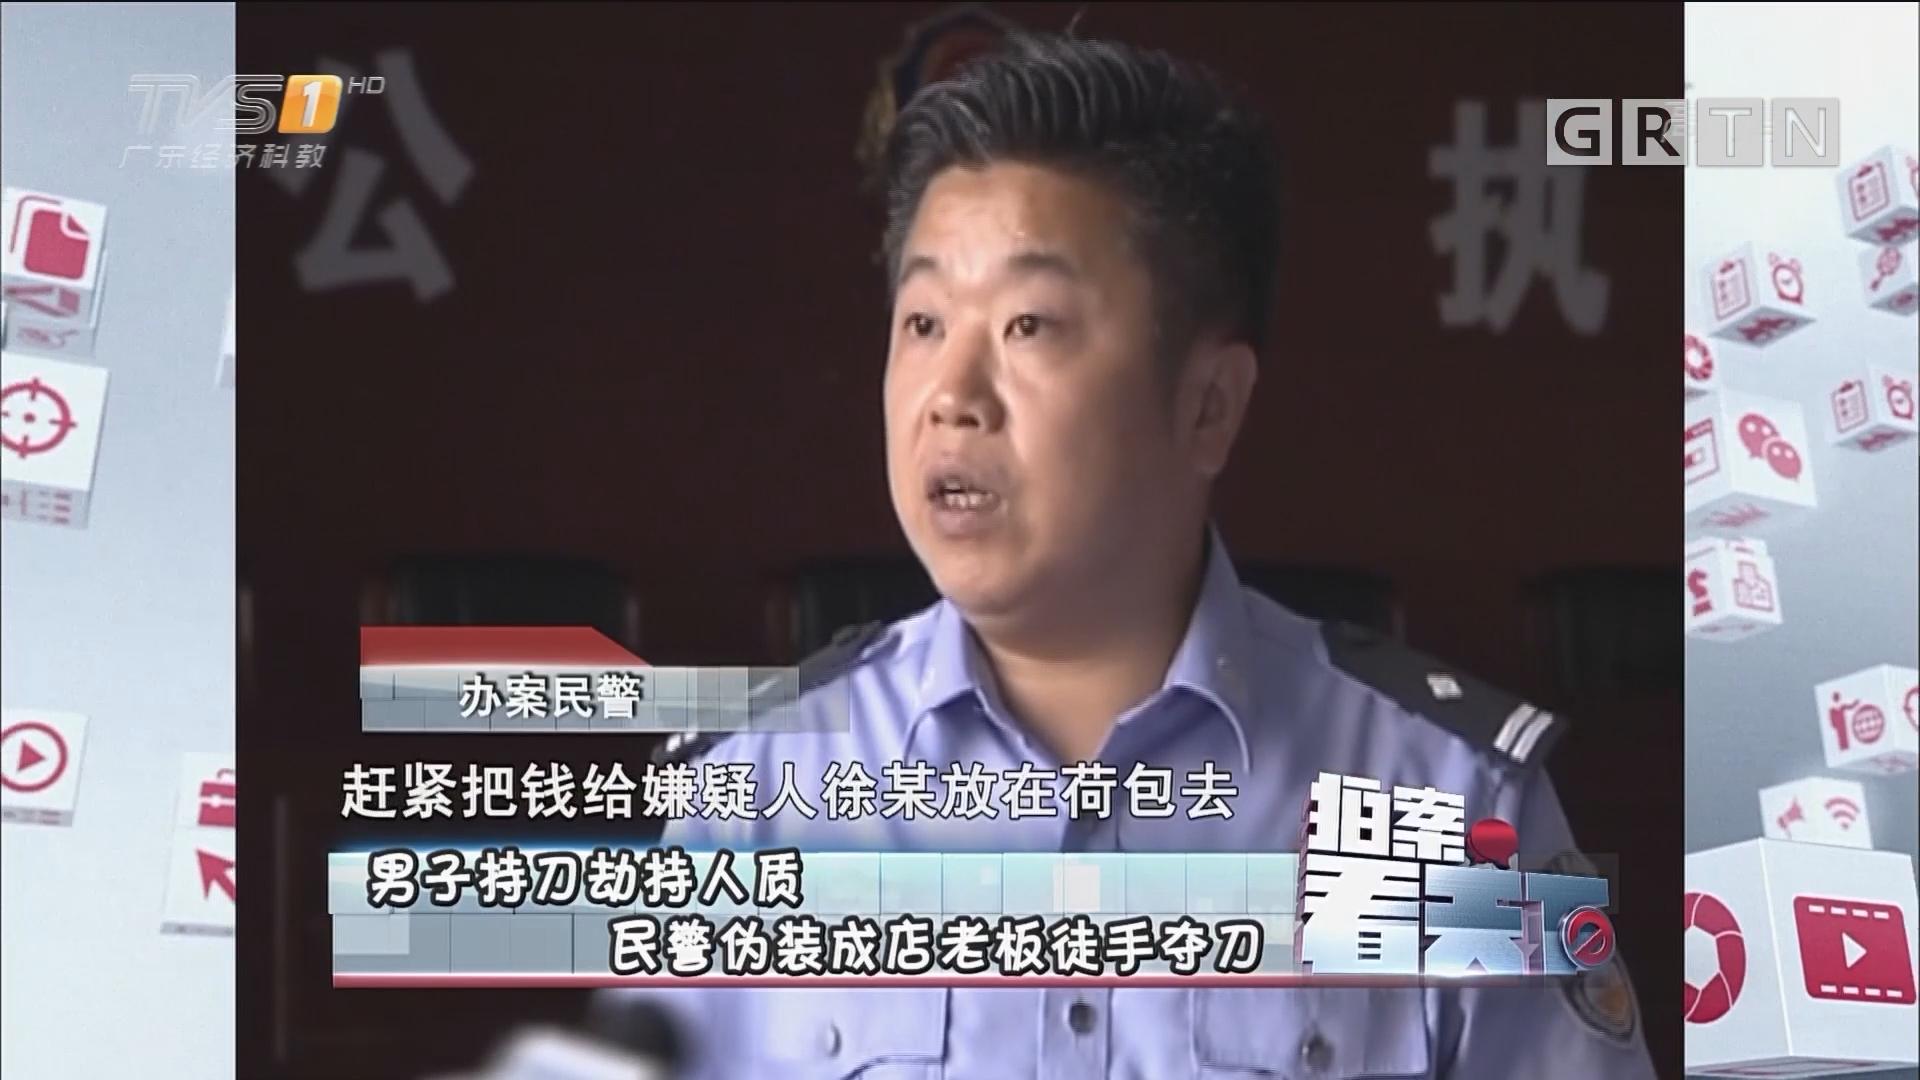 [HD][2017-08-11]拍案看天下:男子持刀劫持人质 民警伪装成店老板徒手夺刀